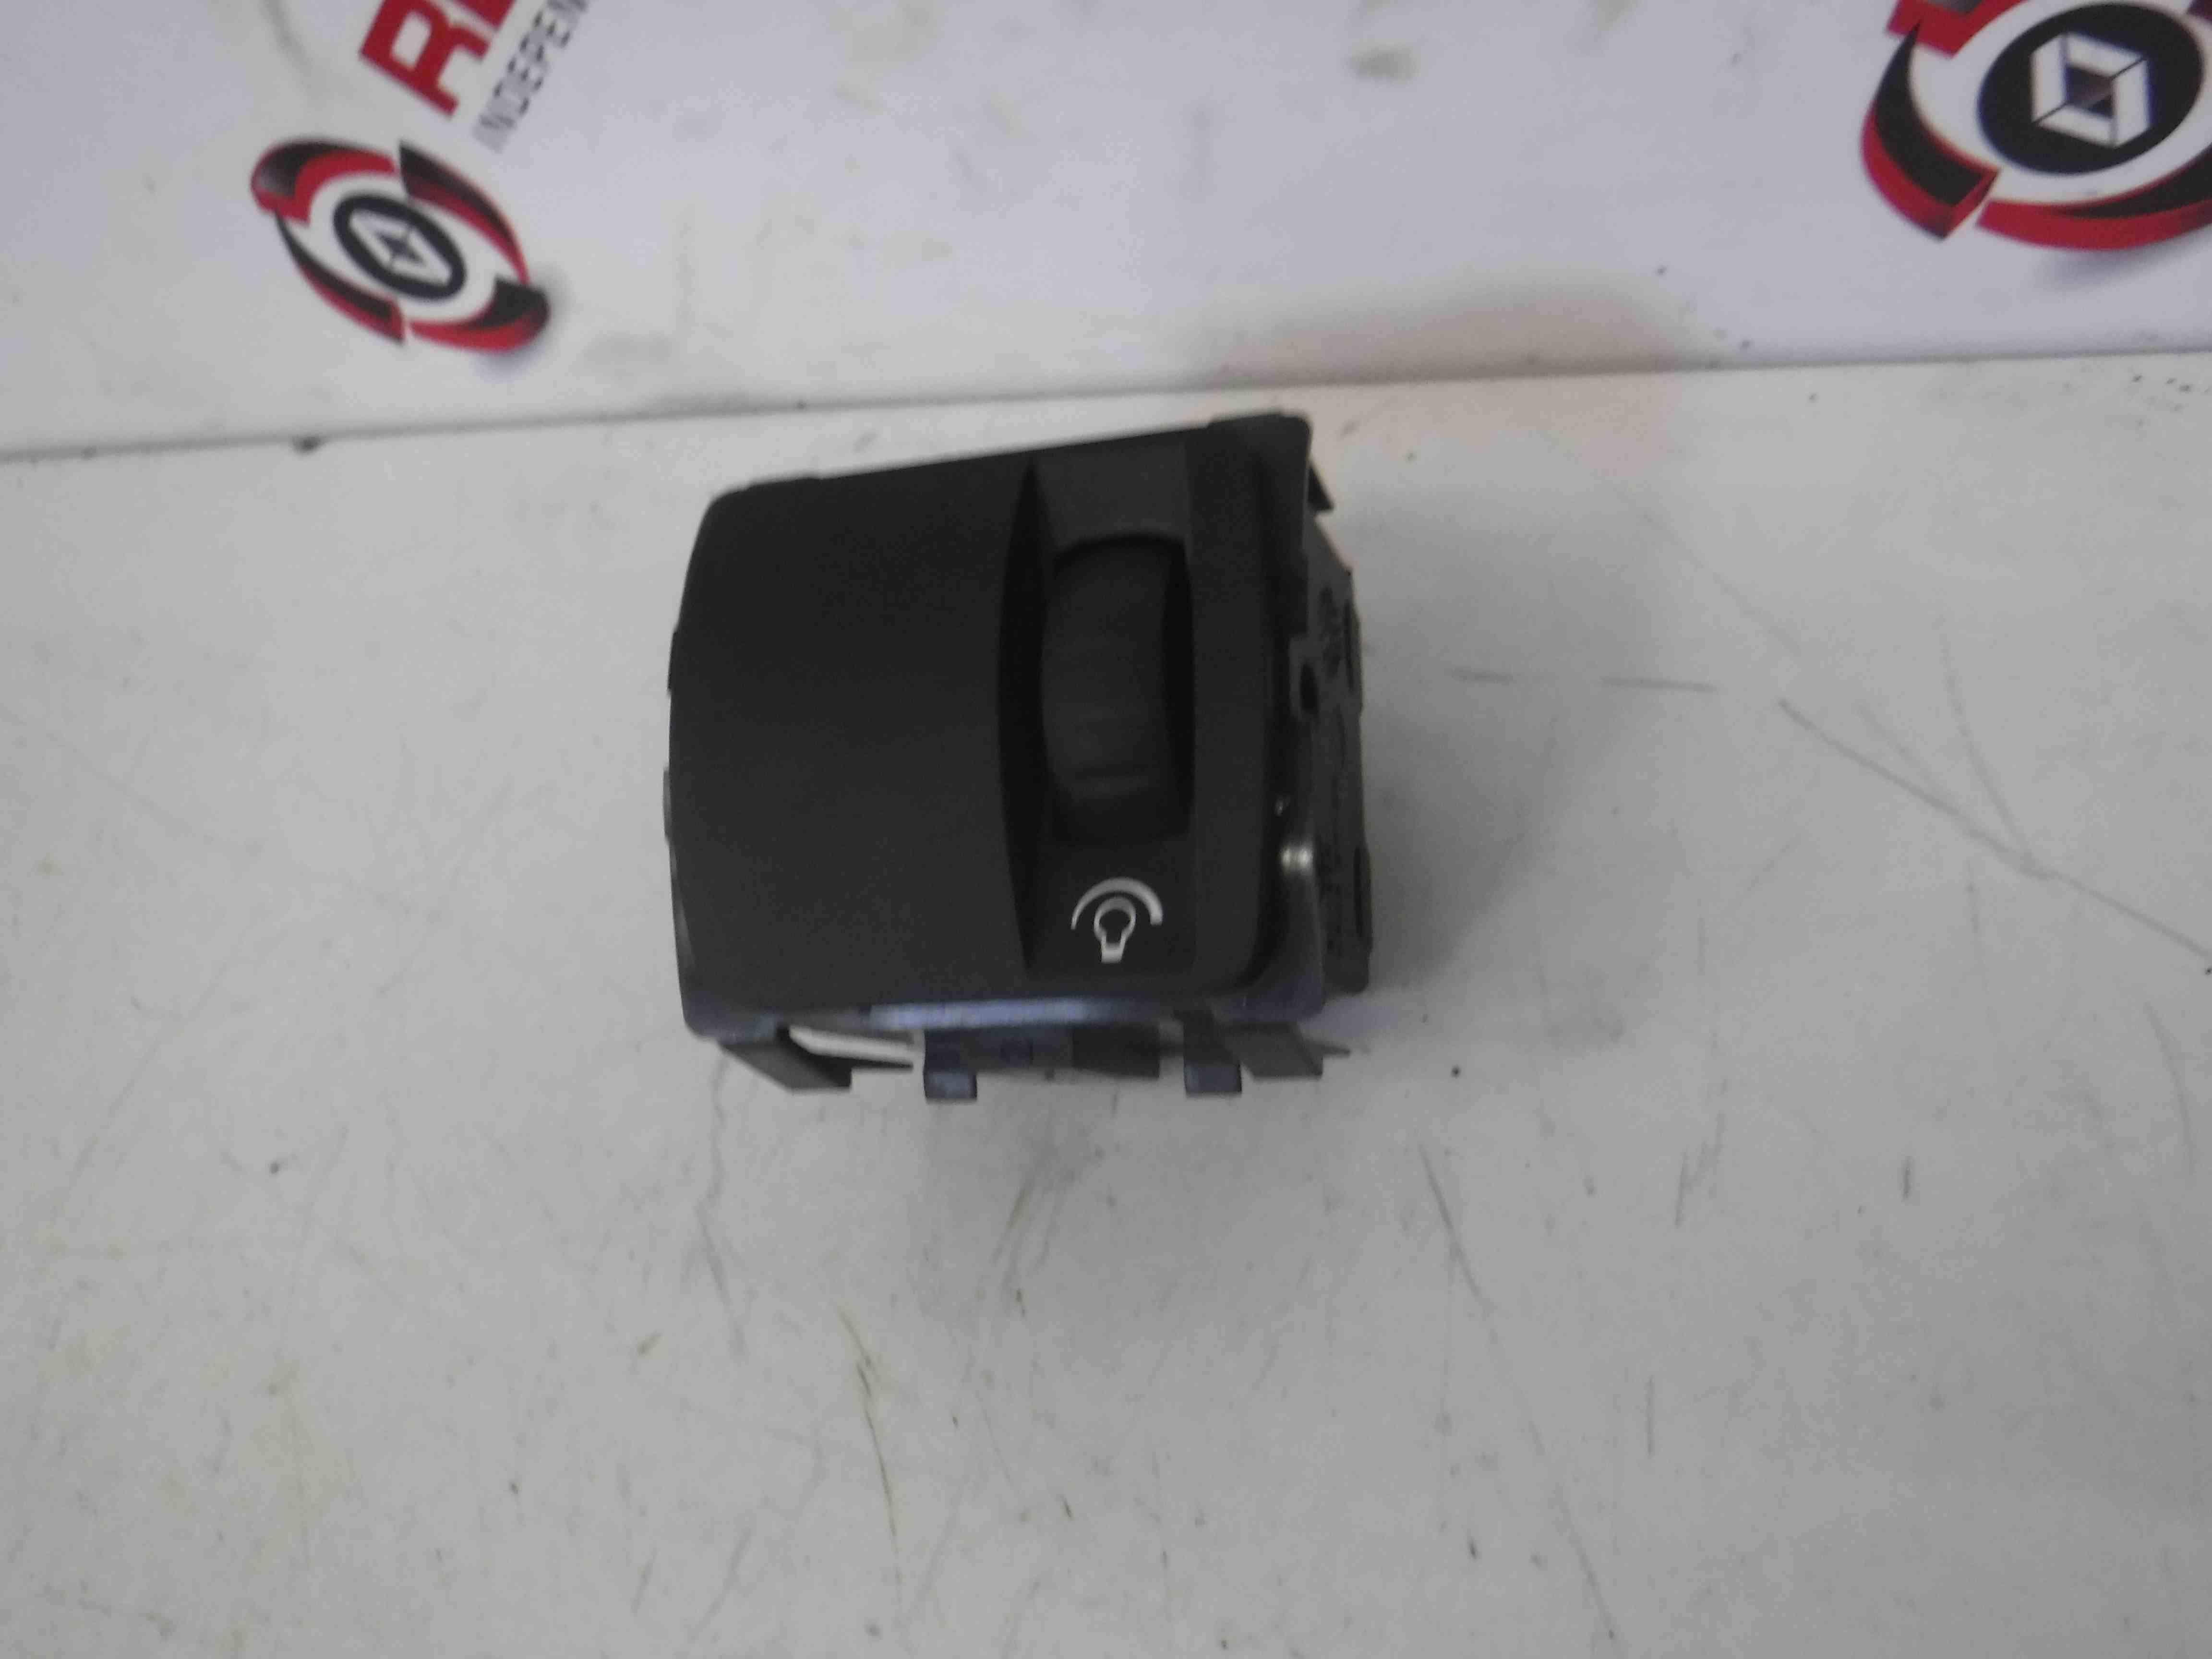 Renault Clio MK4 2013-2015 Dashboard Lights Dimmer Switch Adjuster 259808163r